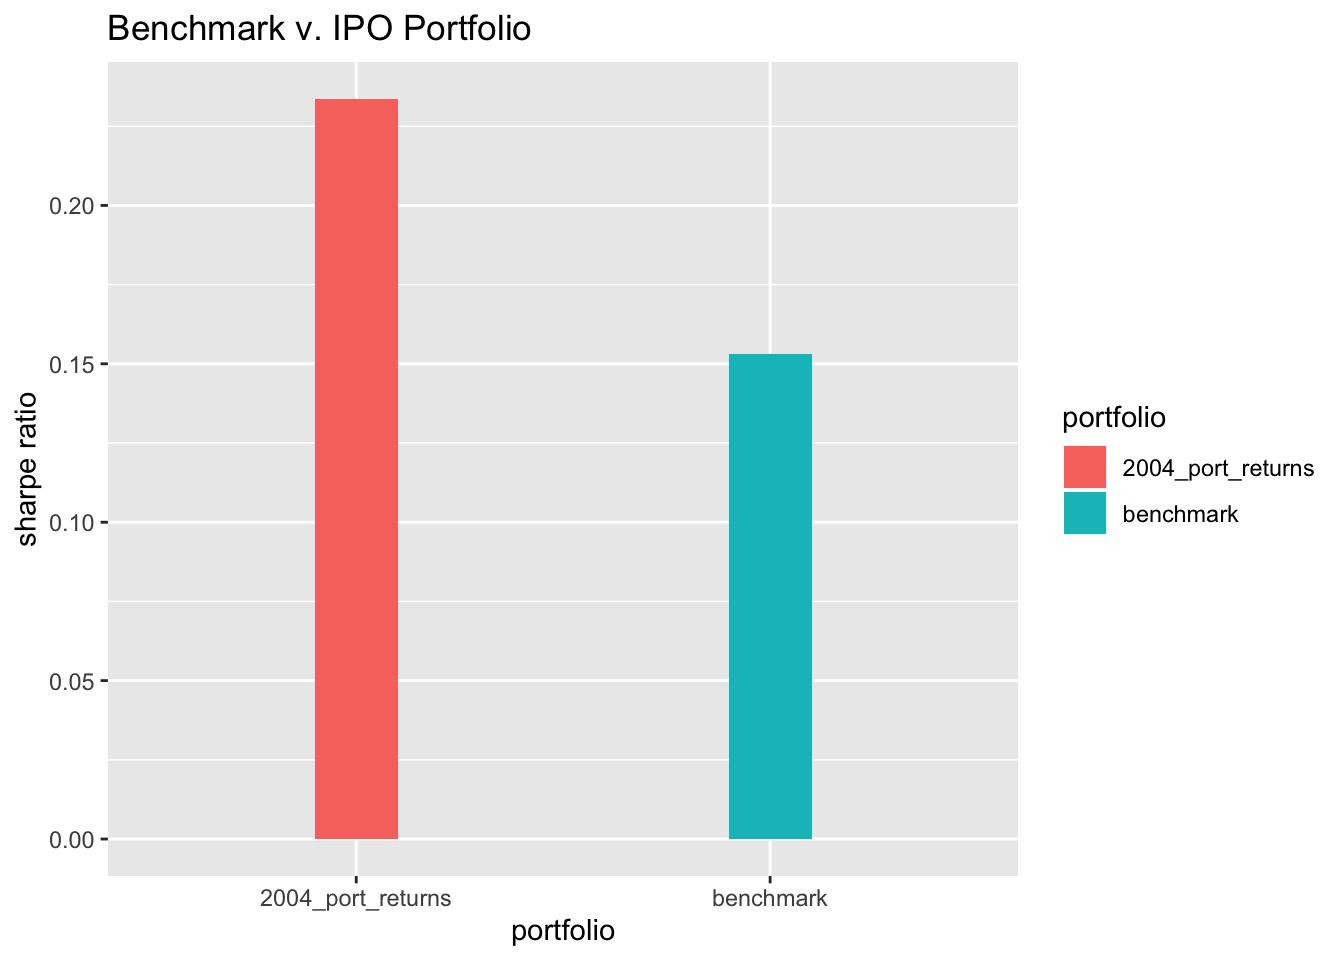 IPO Portfolios and a Benchmark